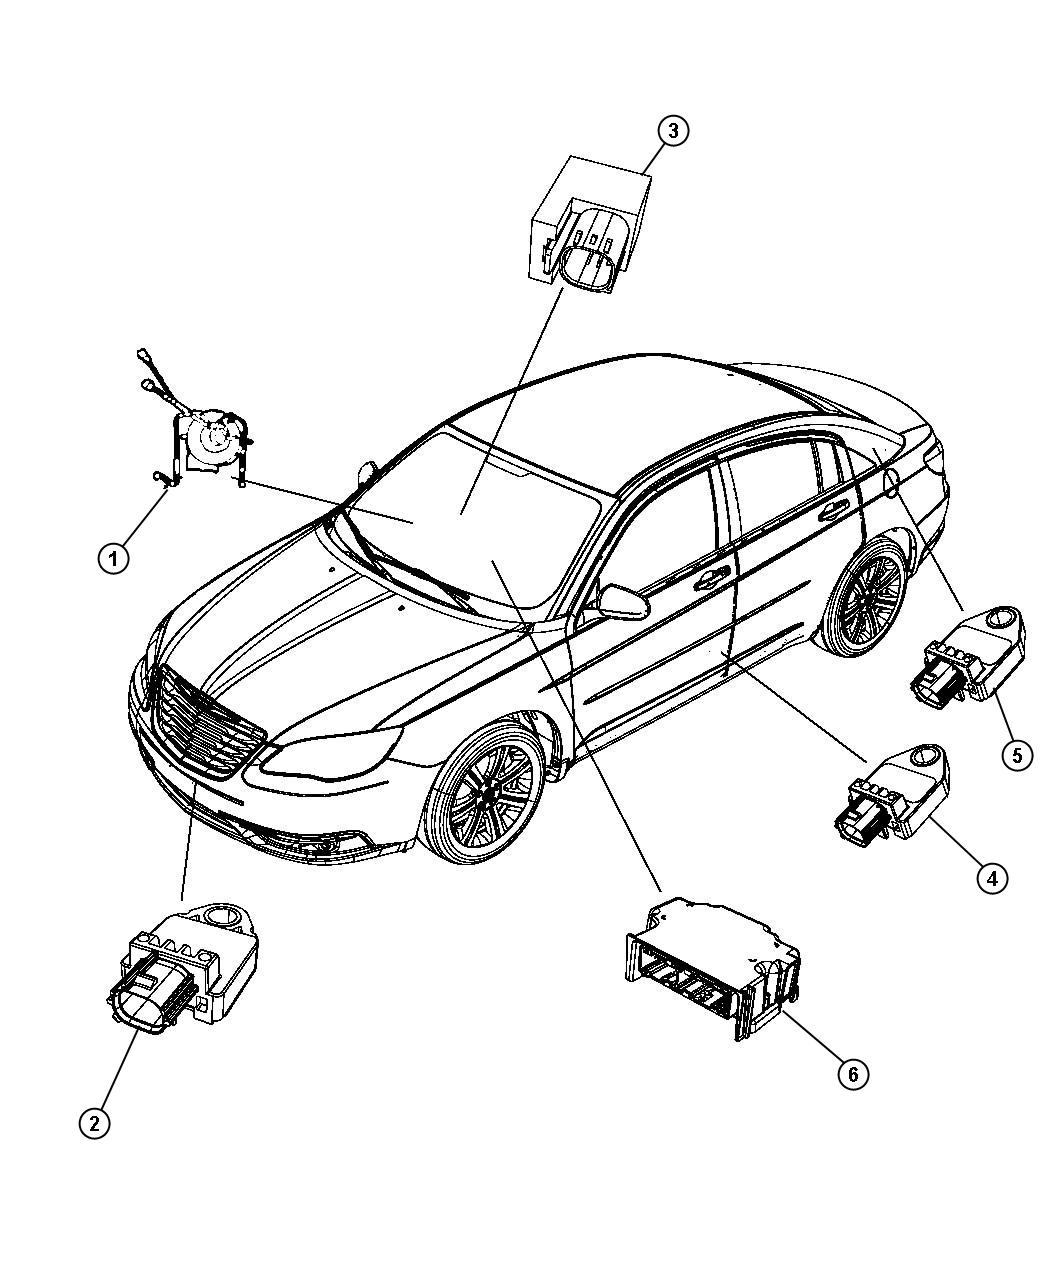 2013 Chrysler 200 Module. Air bag control, occupant